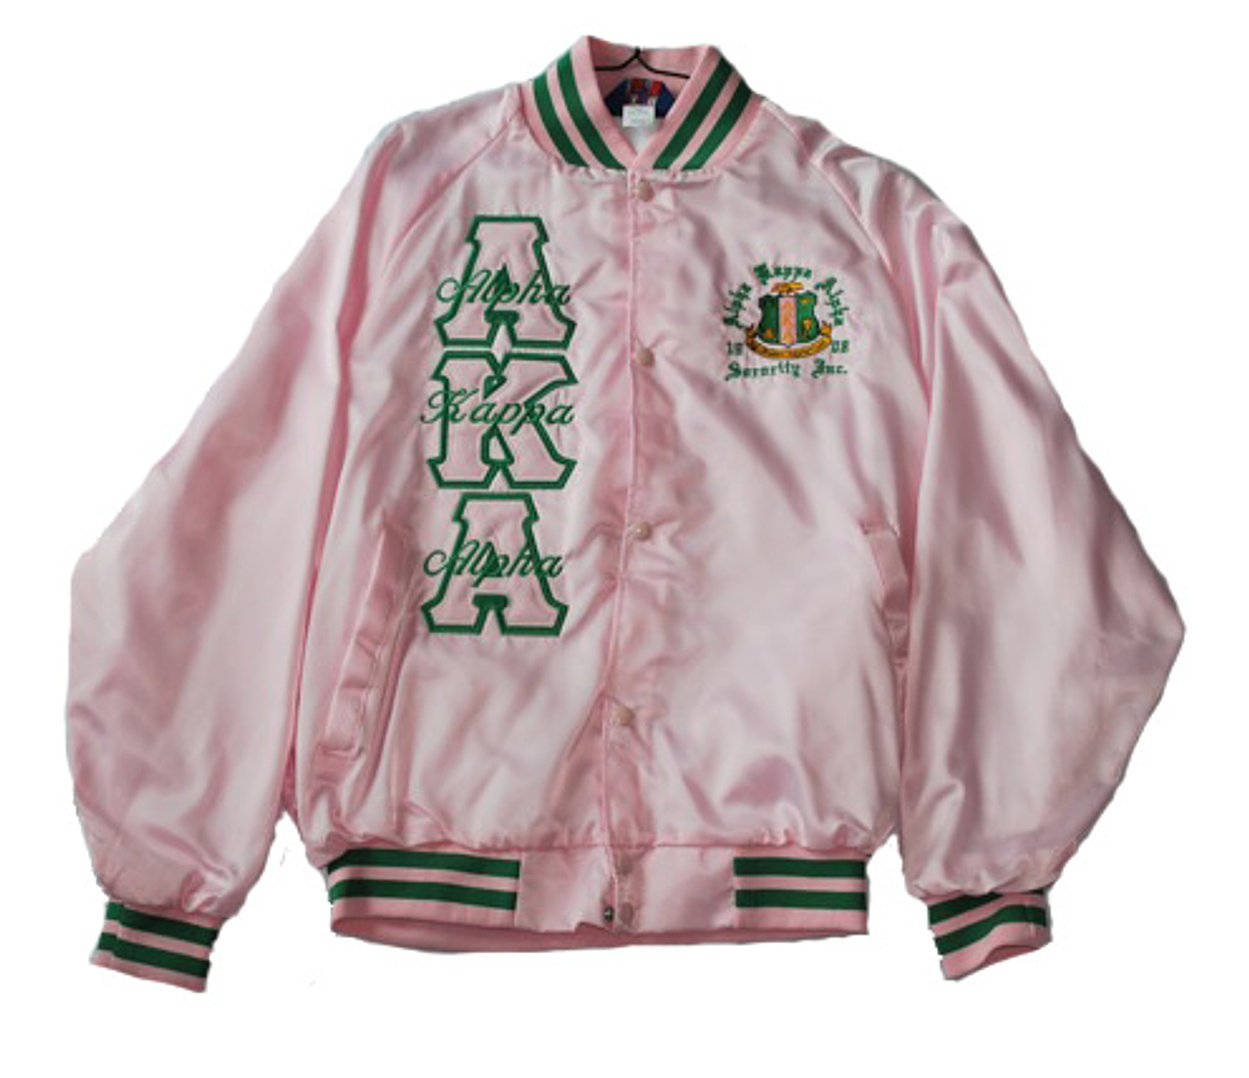 Kanework Kanes, Custom Greek Apparel, Line jackets, Jerseys, Tikis